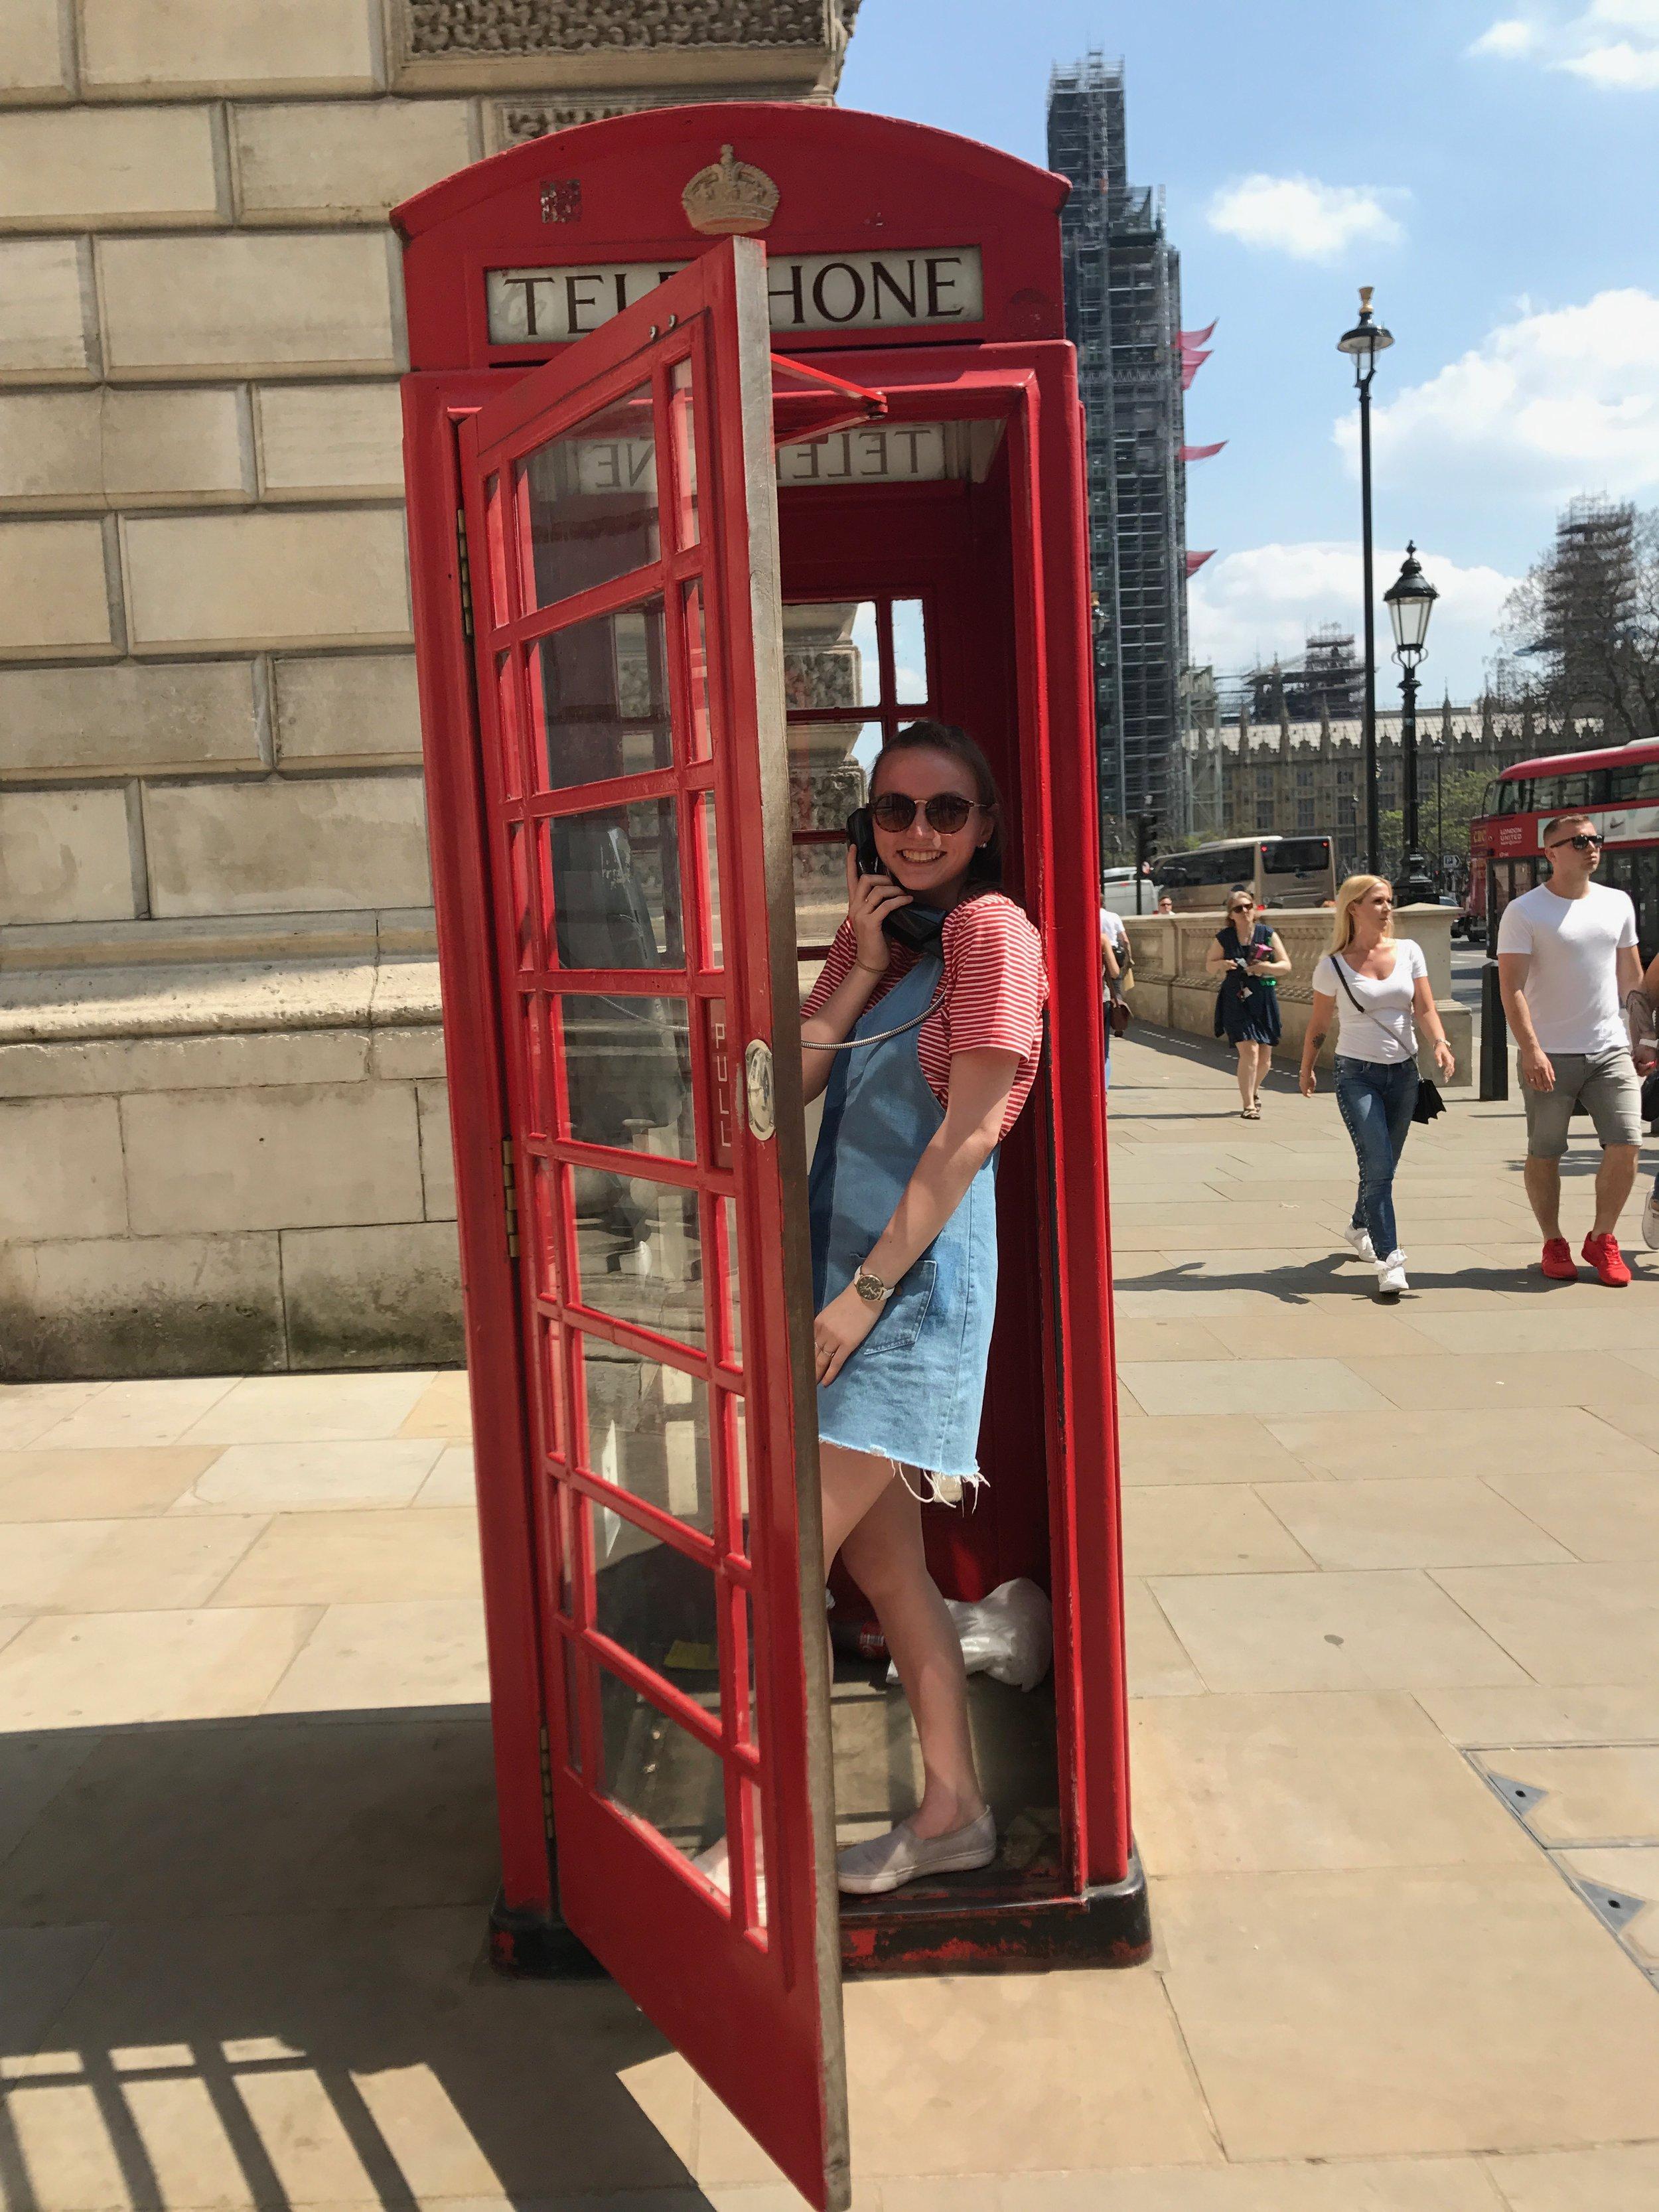 Kristina MacLennan - Phone Booth in London, England.jpg